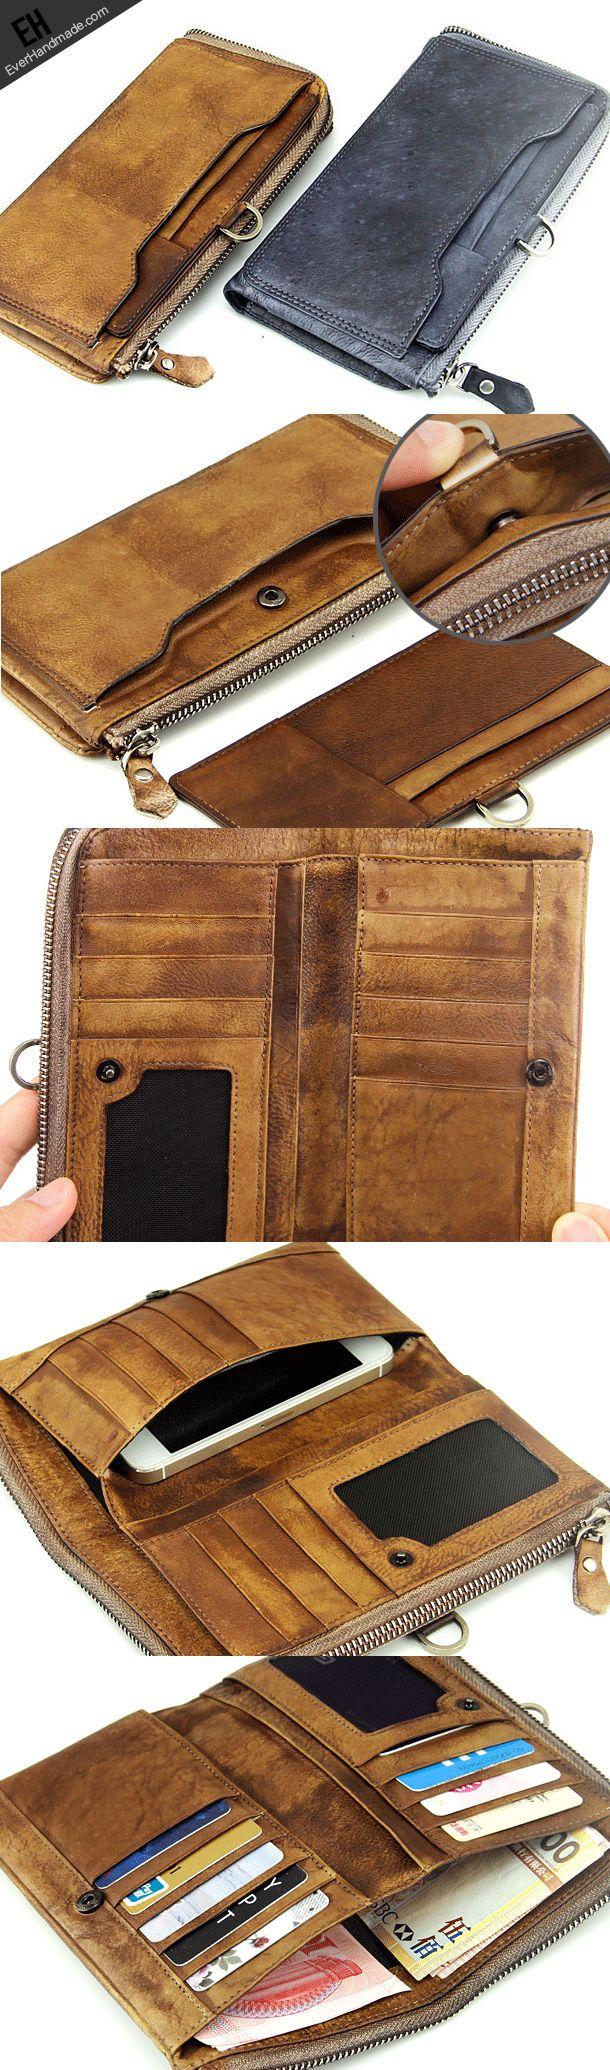 Handmade men long leather wallet men vintage brown gray long wallet for him